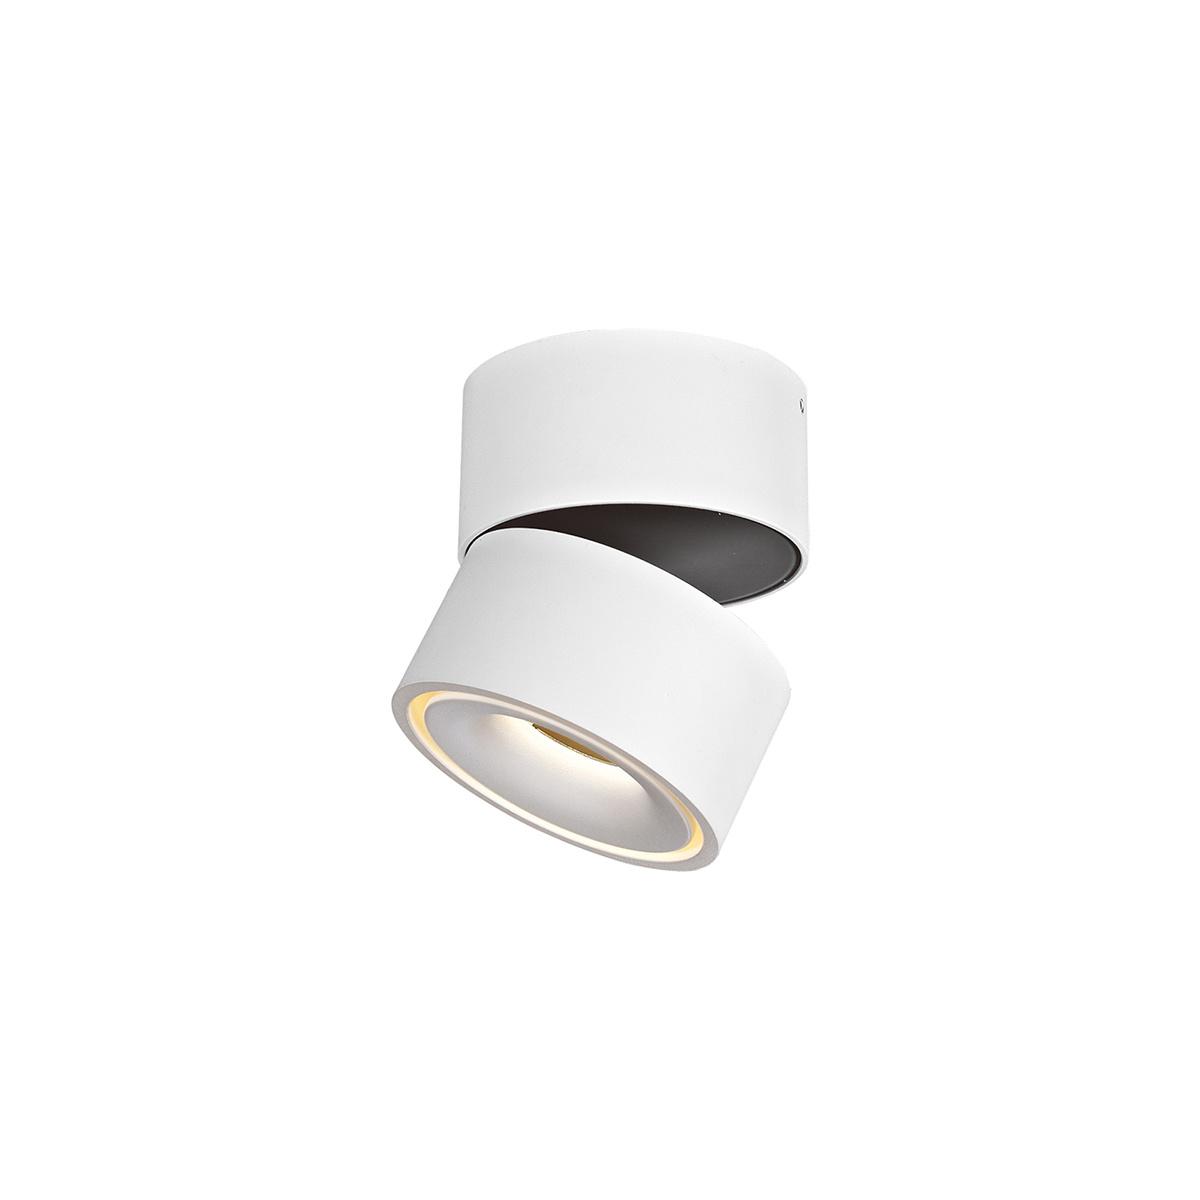 Look Mini 9.2W LED 34dgr 2700K 845lm CRI>90 Dimm Black-2